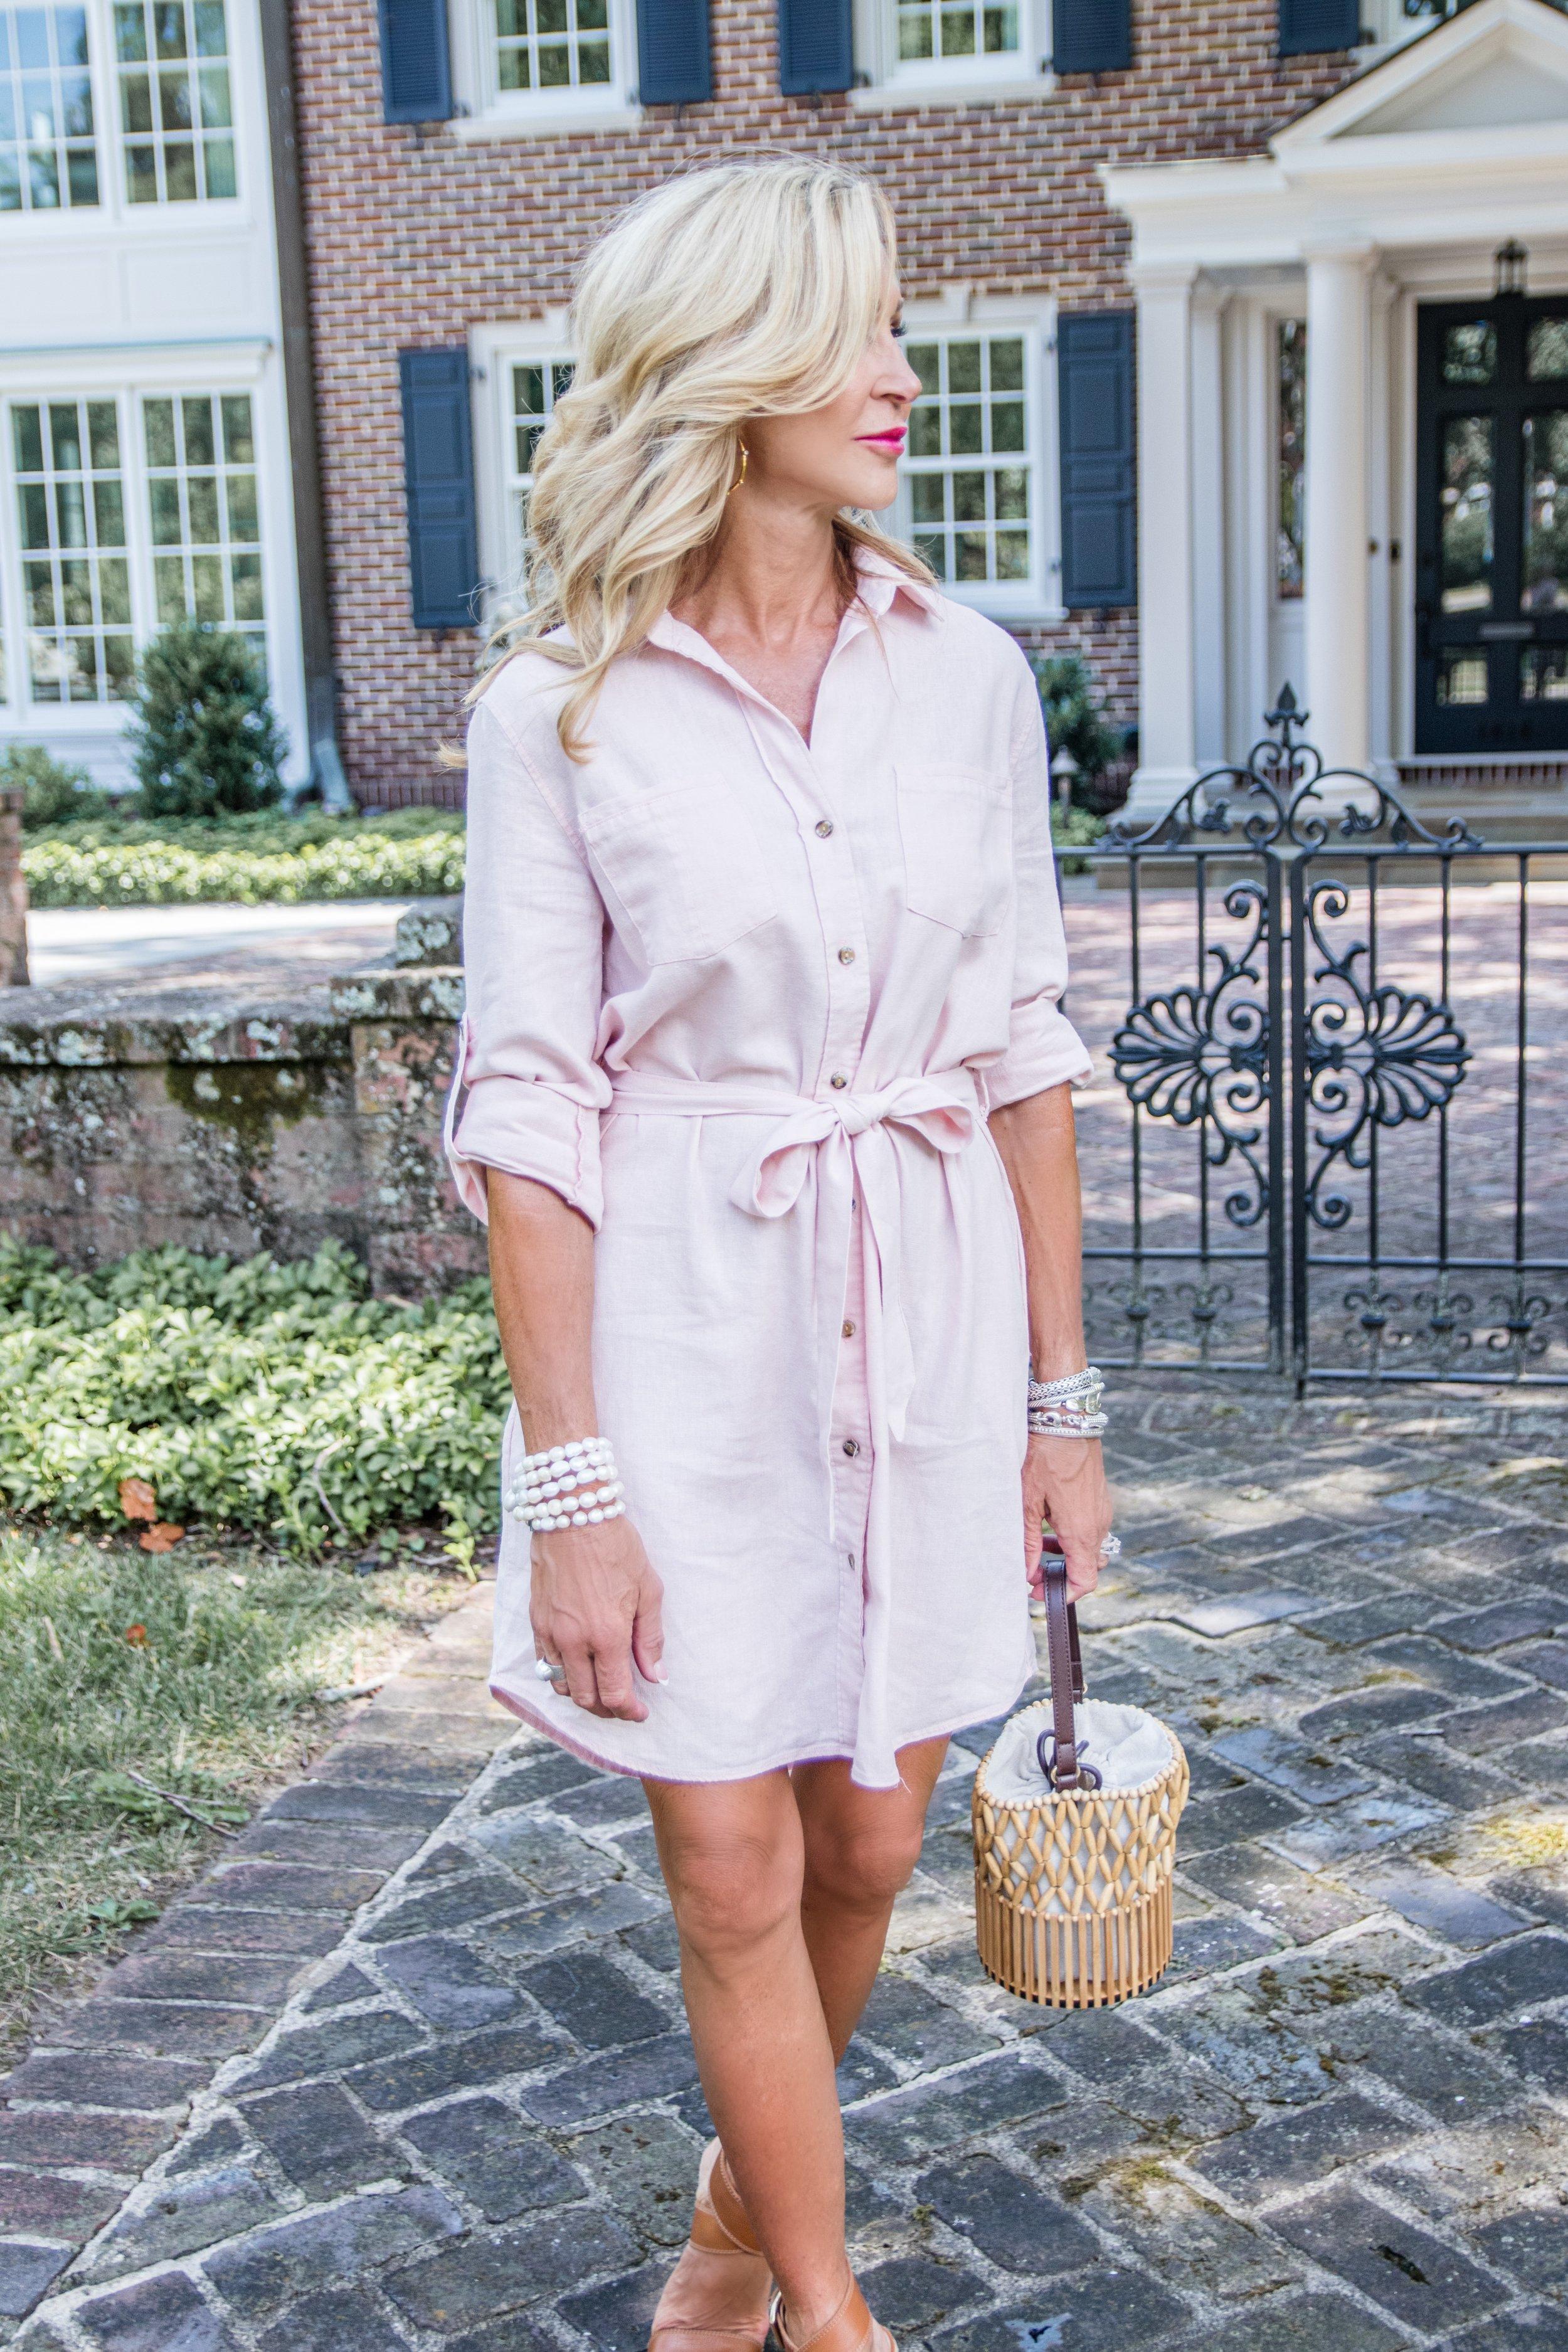 Velvet Heart pink shirtdress - Crazy Blonde Style